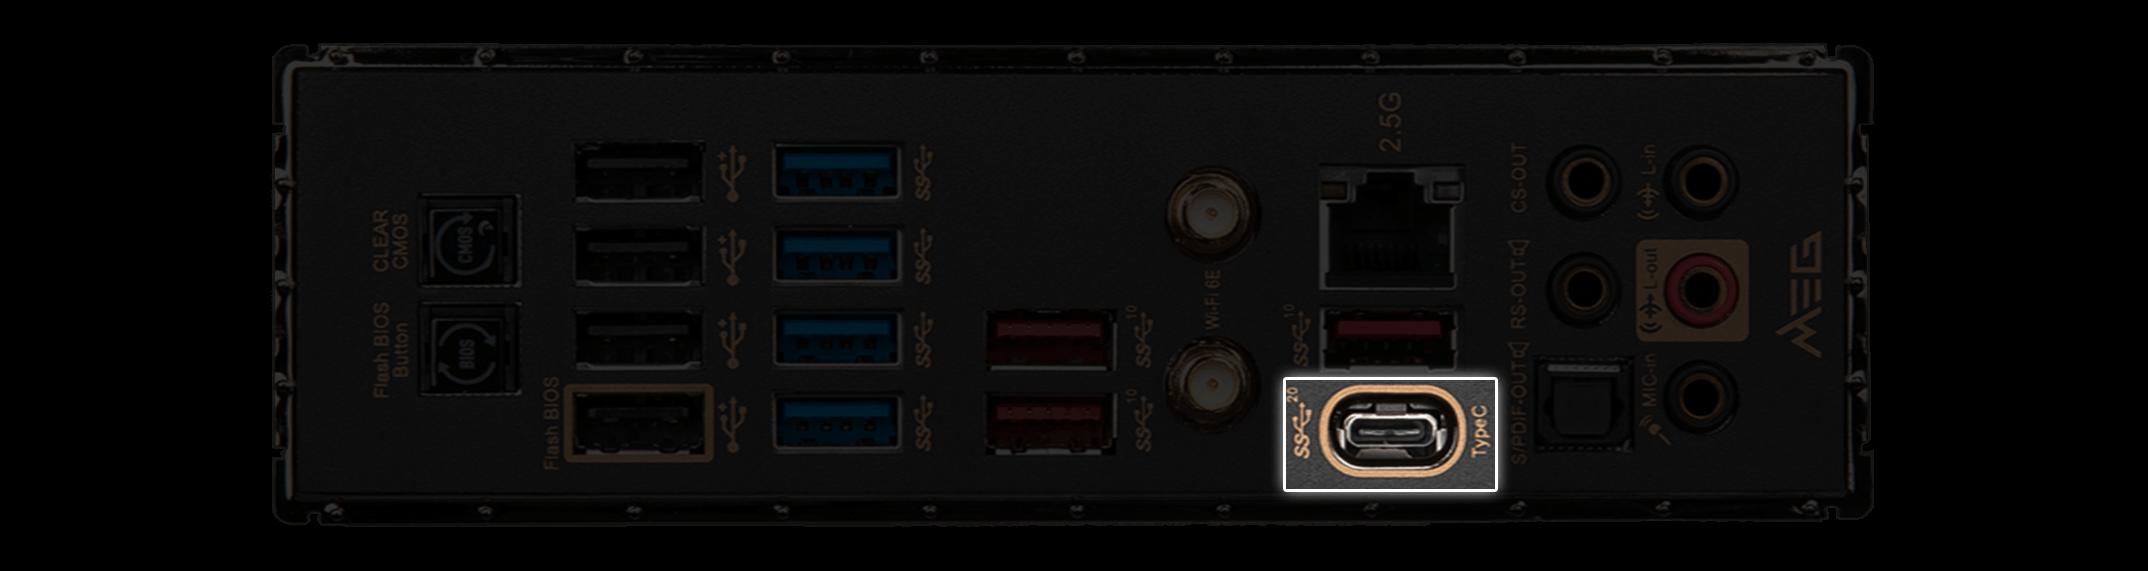 MSI X570S Motherboard Faster Lightning USB 20G